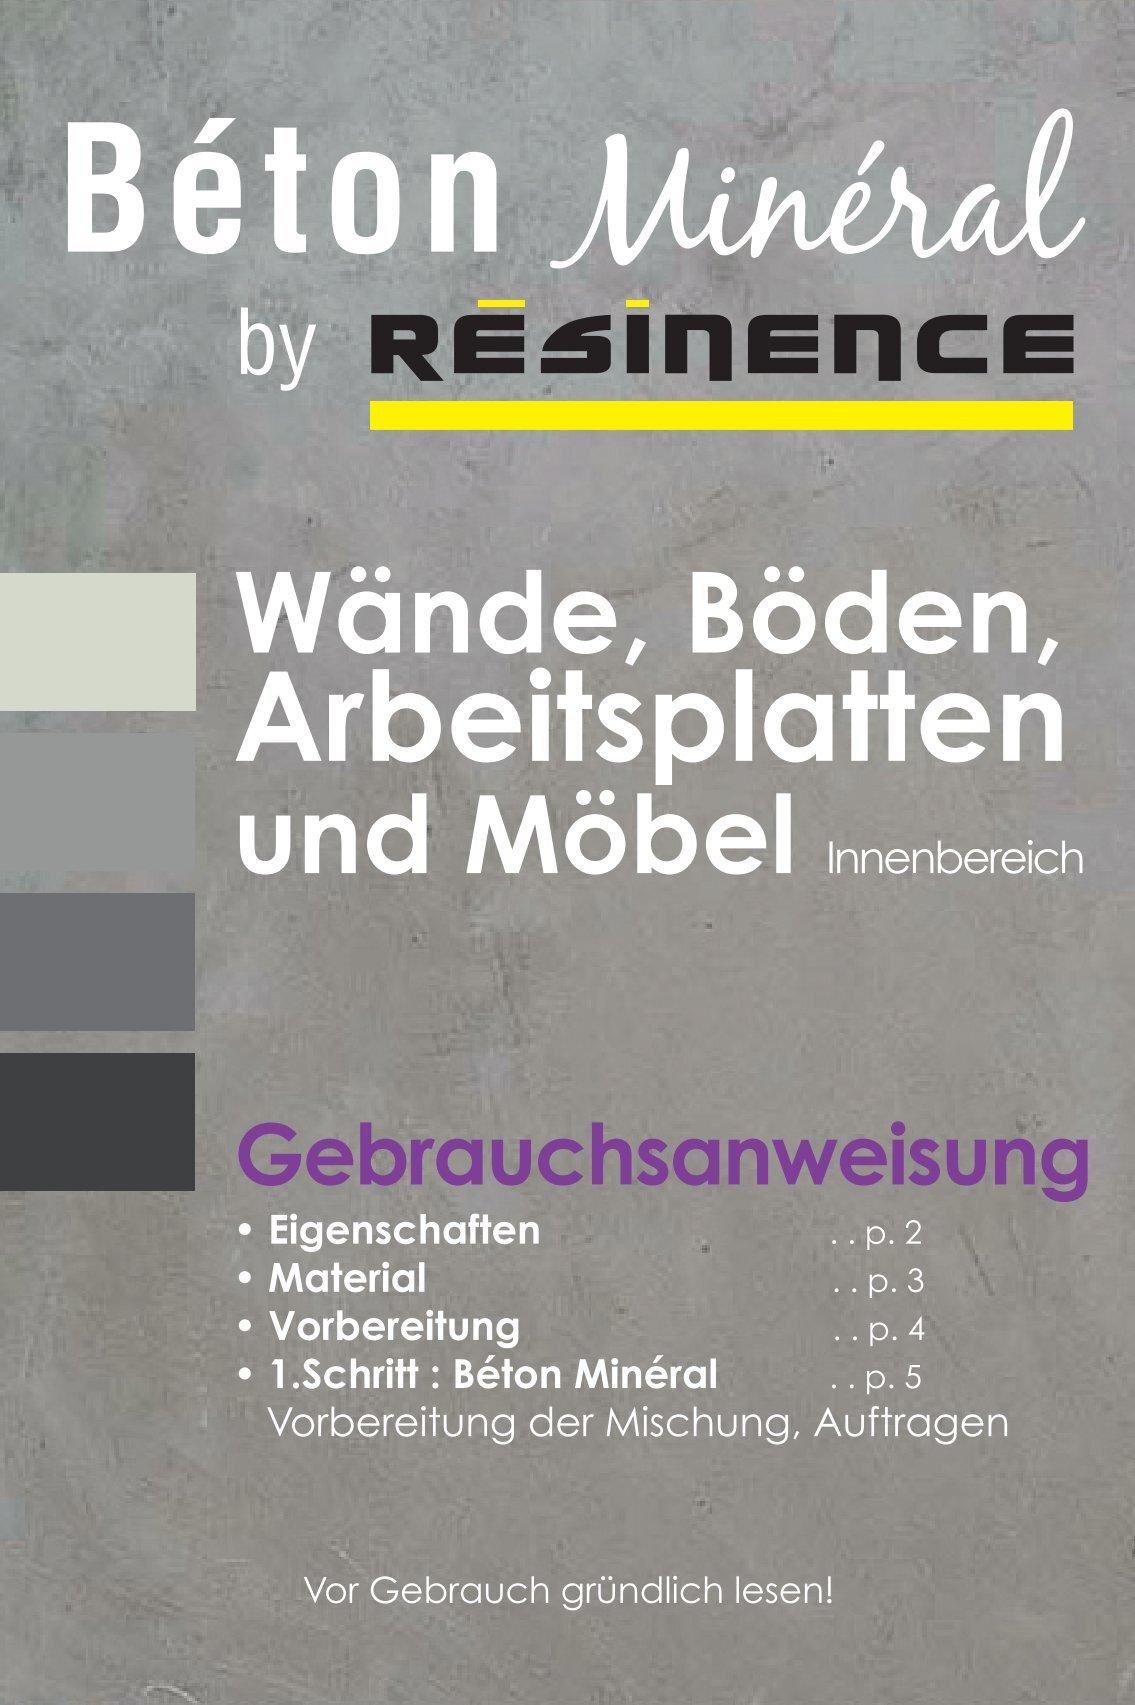 Resinence.com